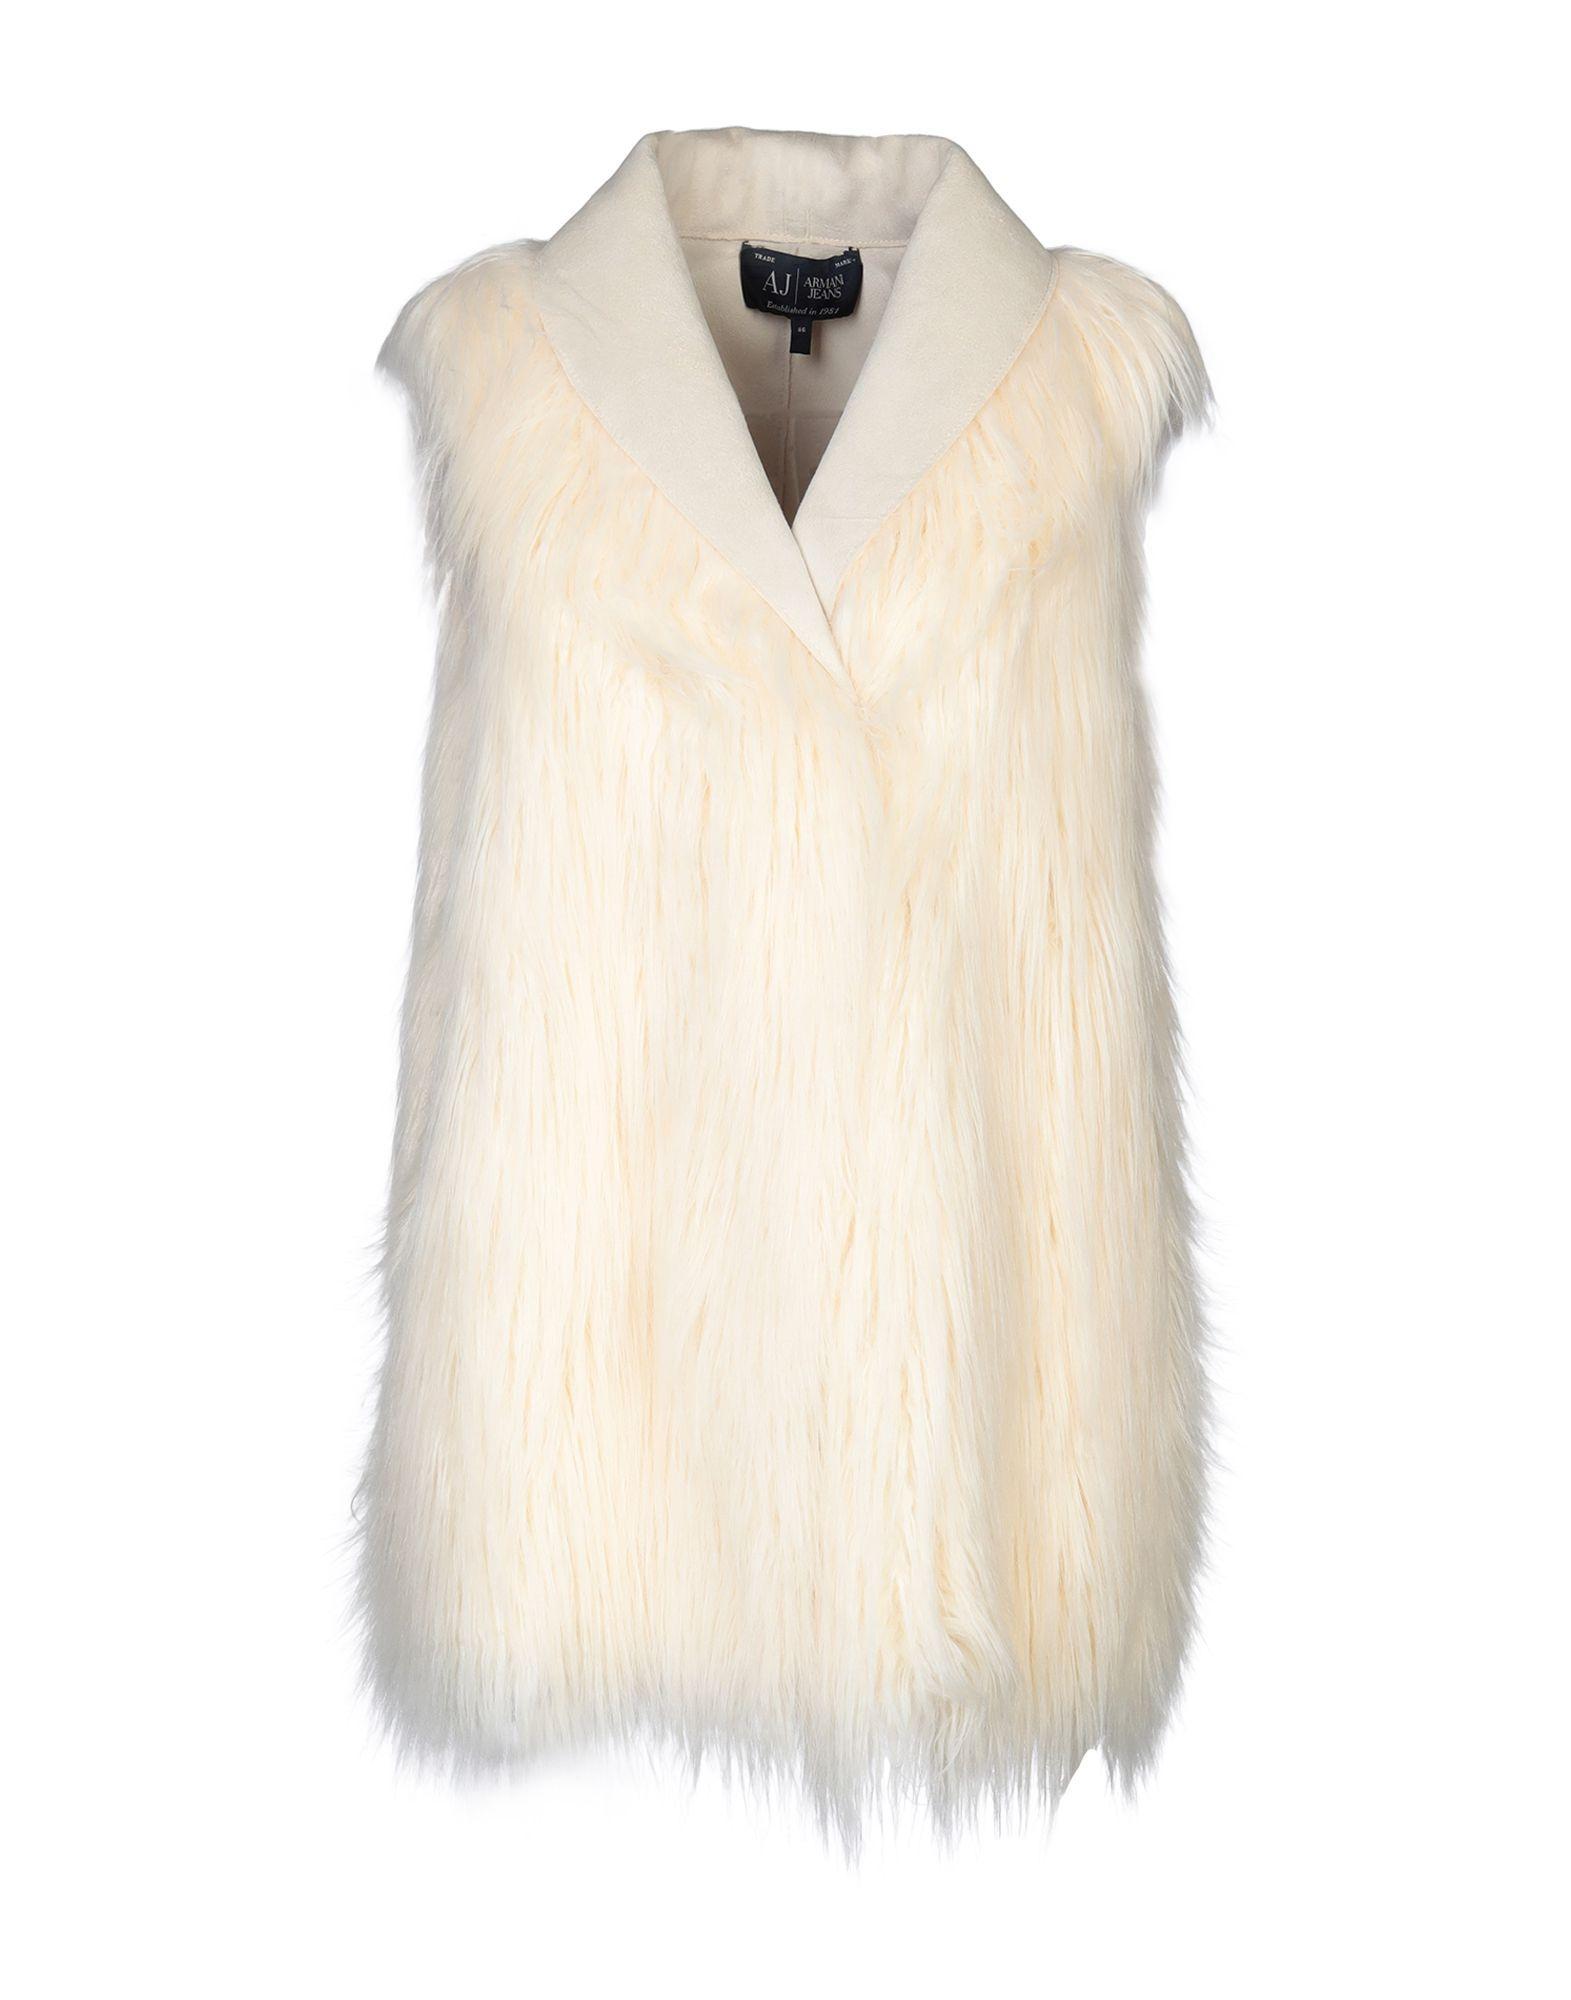 Armani Jeans Ivory Faux Fur Gilet